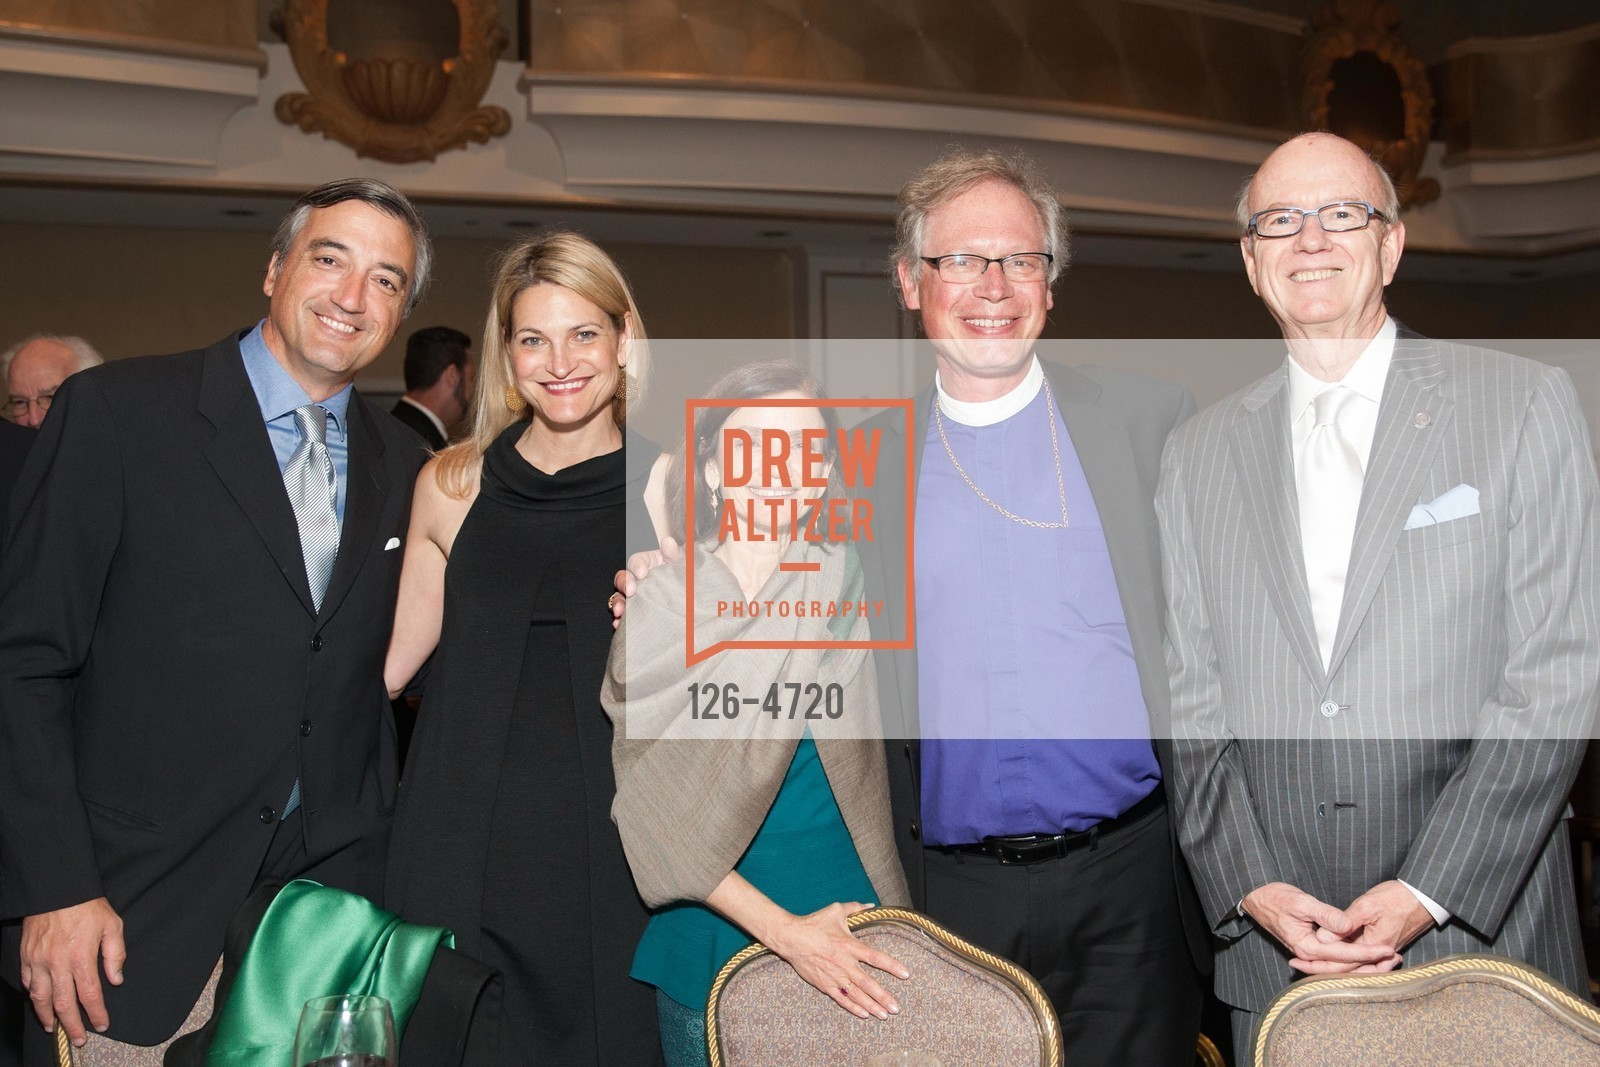 Davide Pacchini, Laura Pacchini, Sheila Andrus, Rt. Rev Marc Andrus, Tom Horn, Photo #126-4720